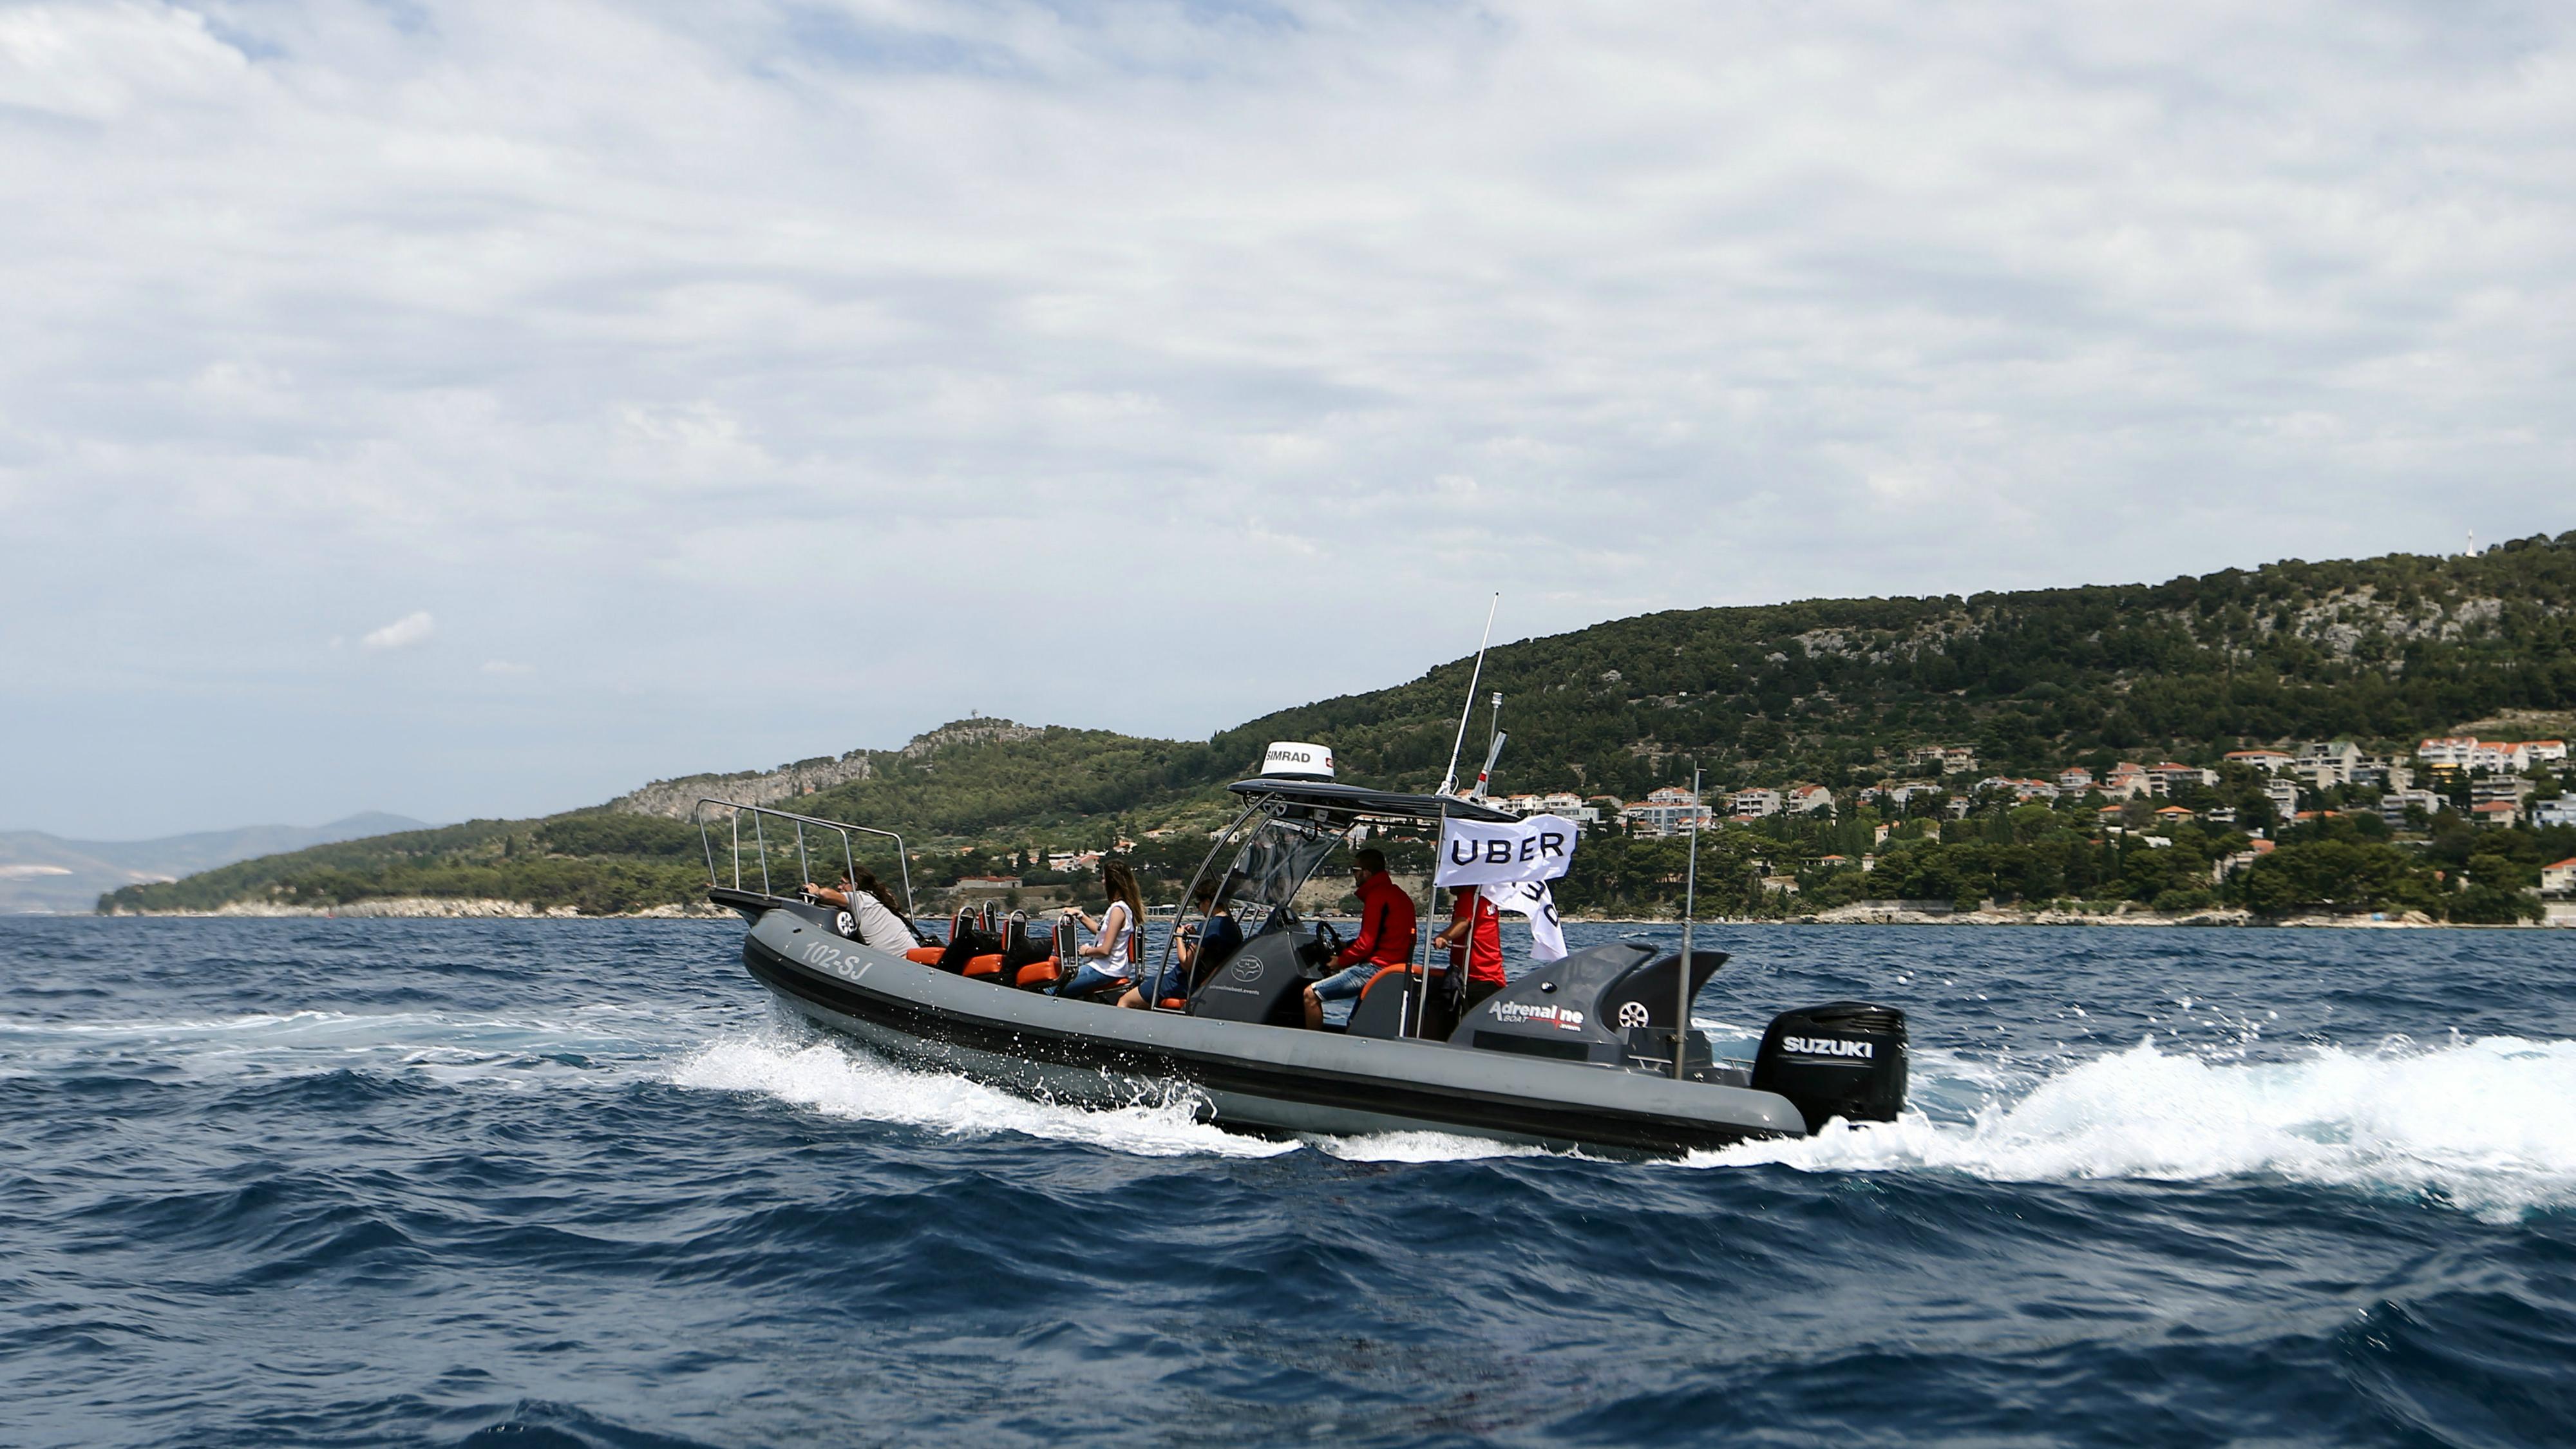 c-boat1-RTS199NM-Antonio Bronic